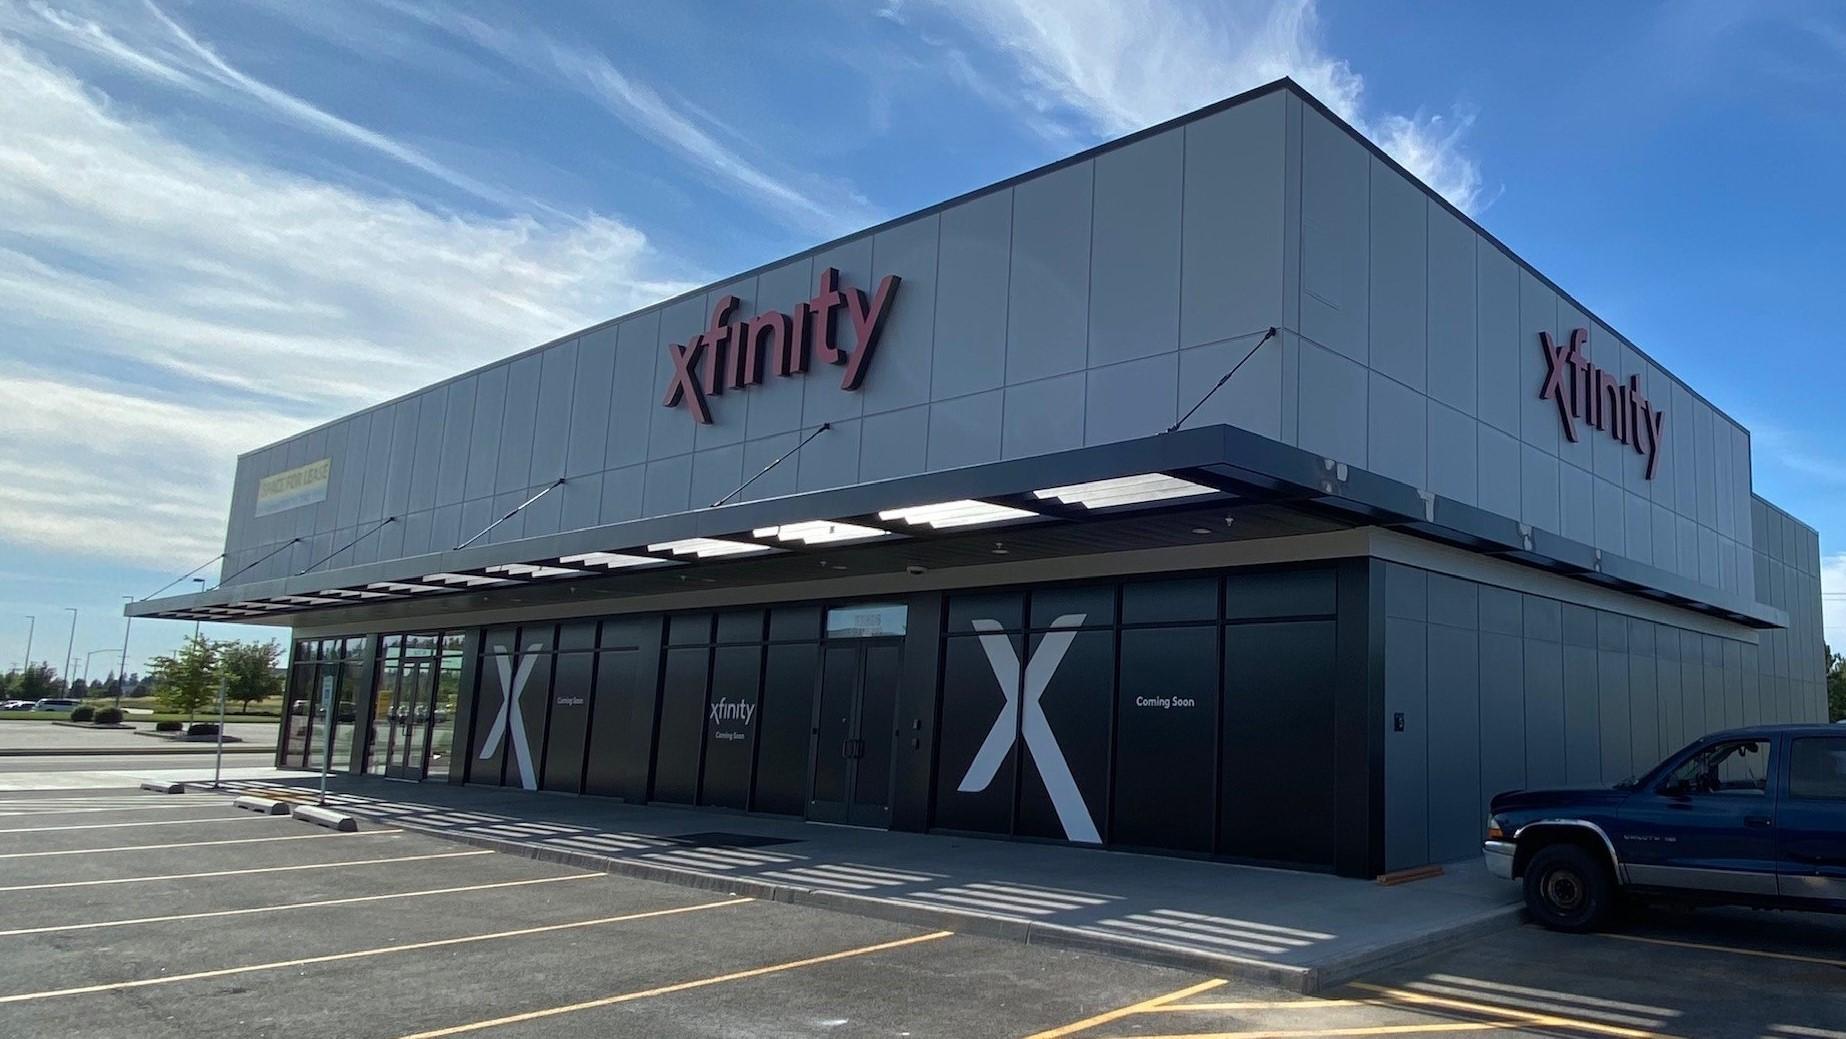 The new Xfinity store Spokane Valley